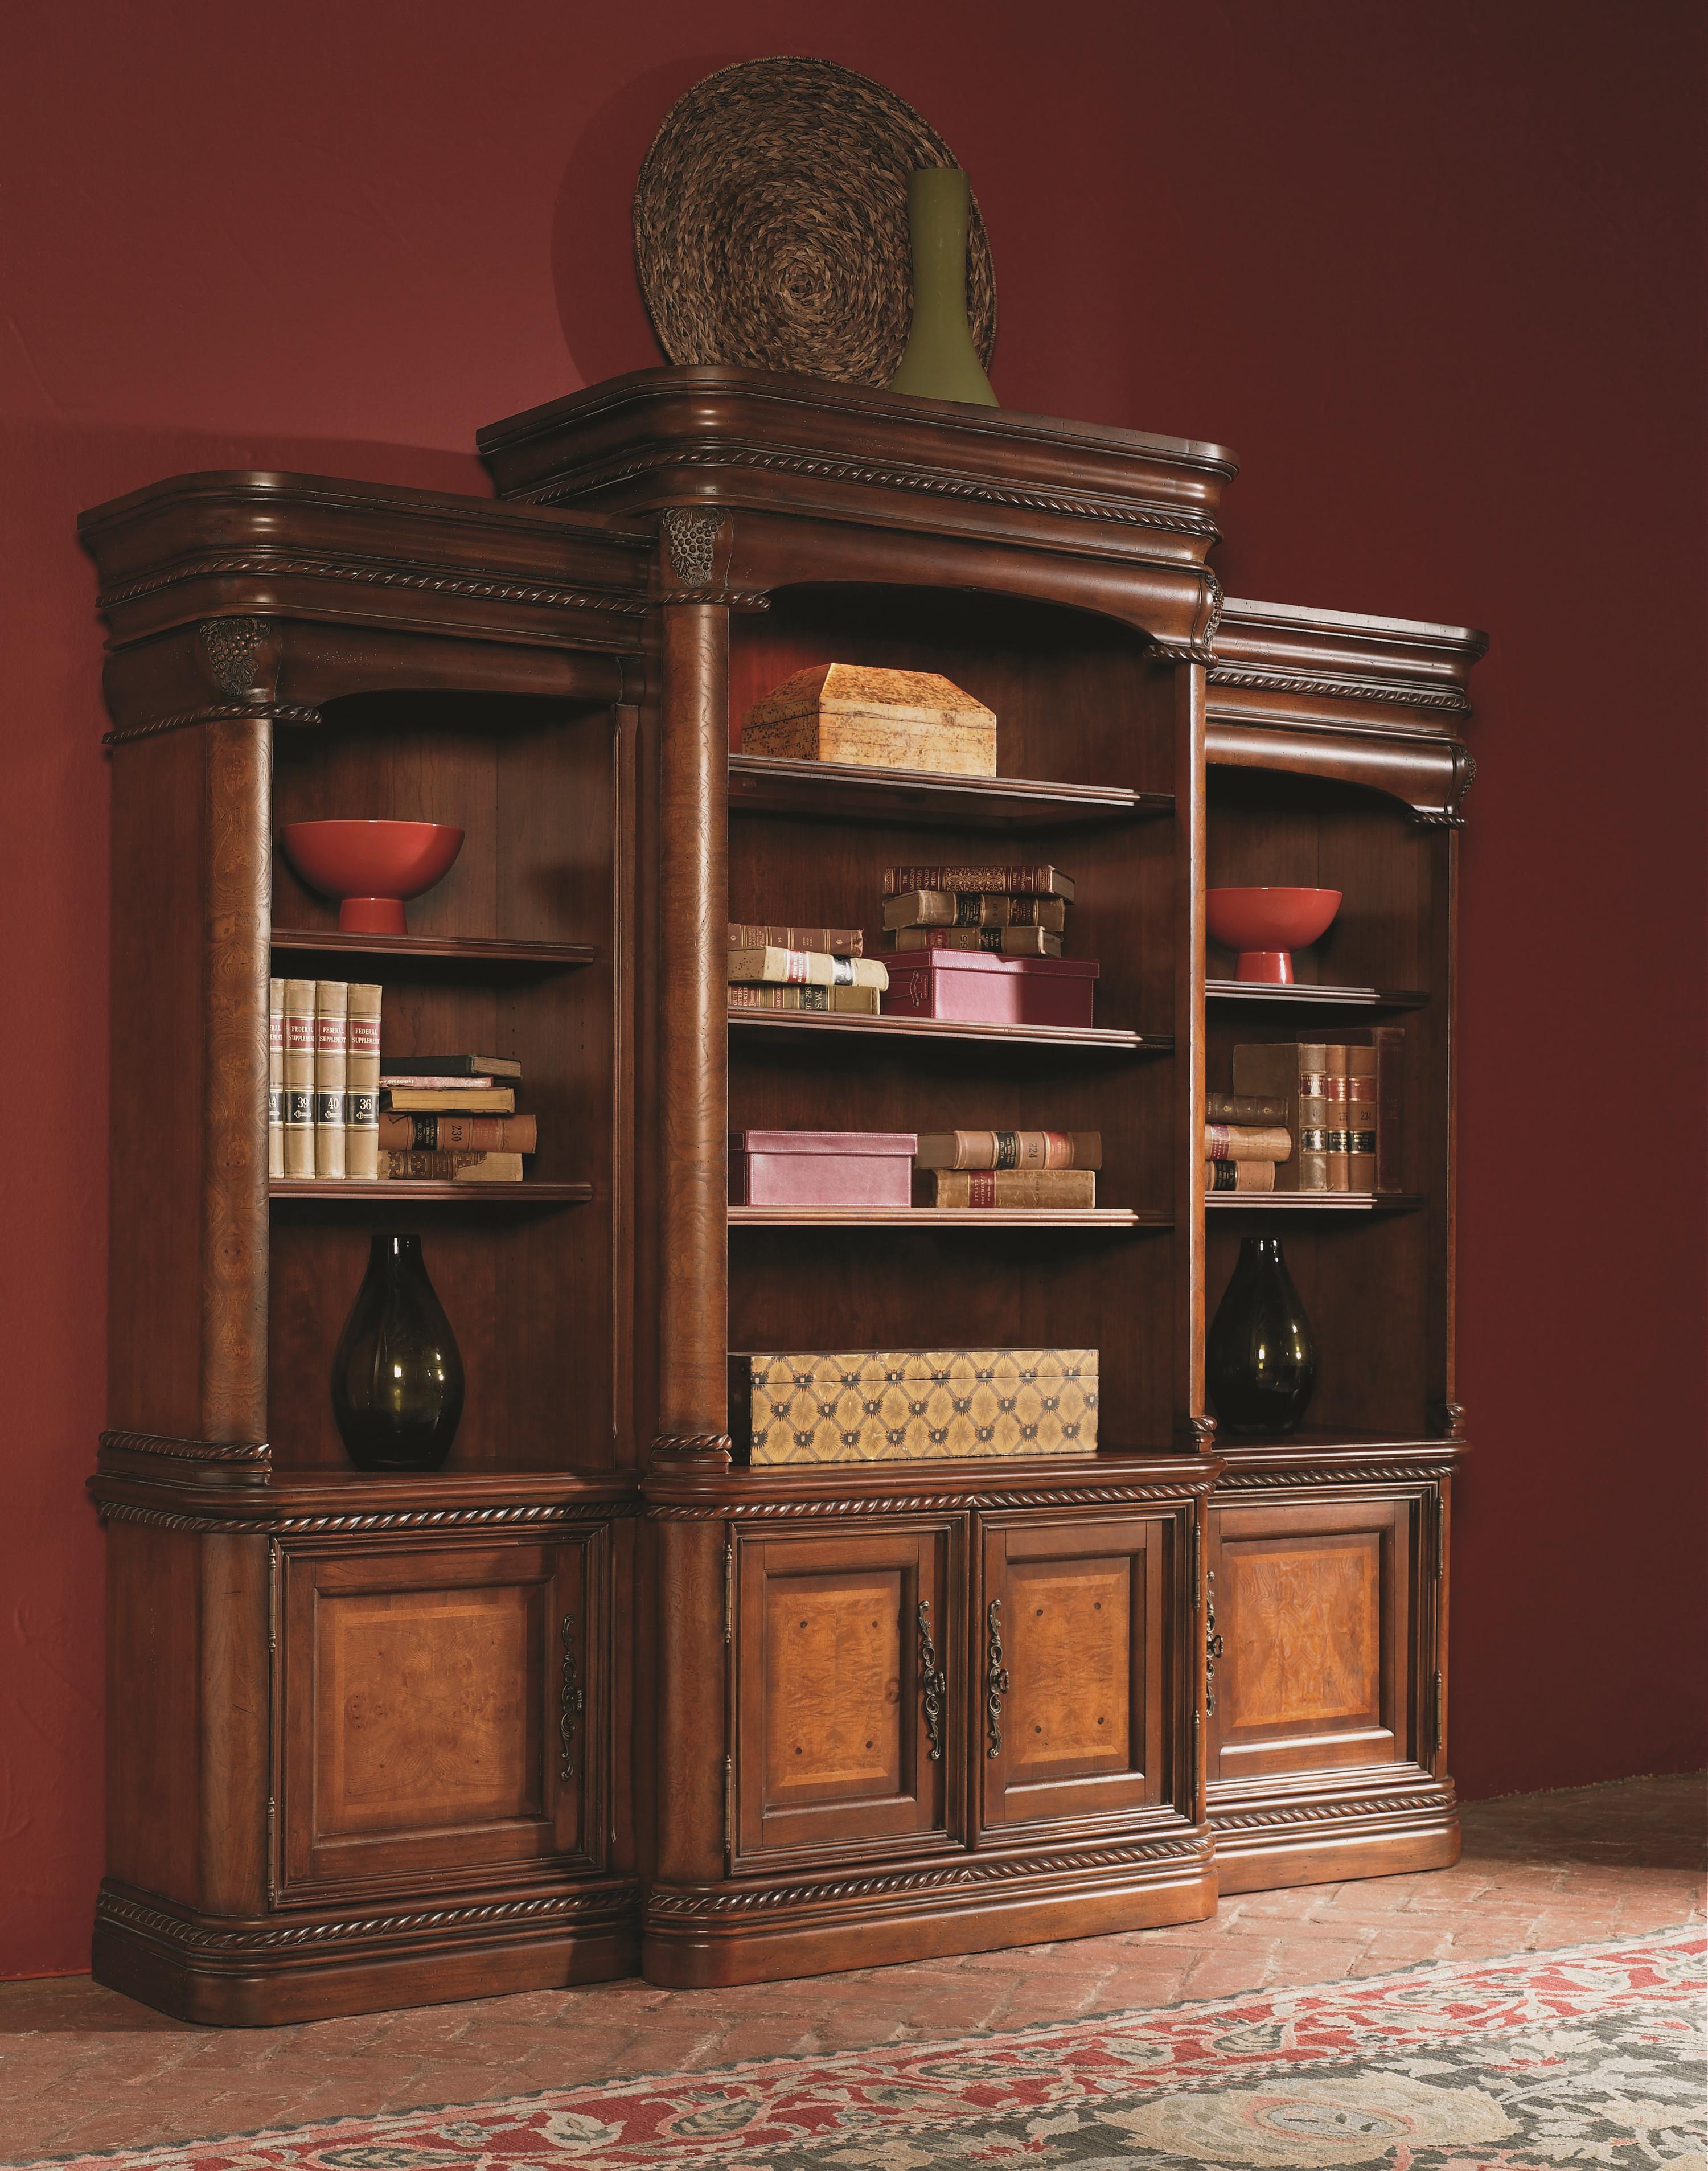 Napa I74 By Aspenhome Baer 39 S Furniture Aspenhome Napa Dealer